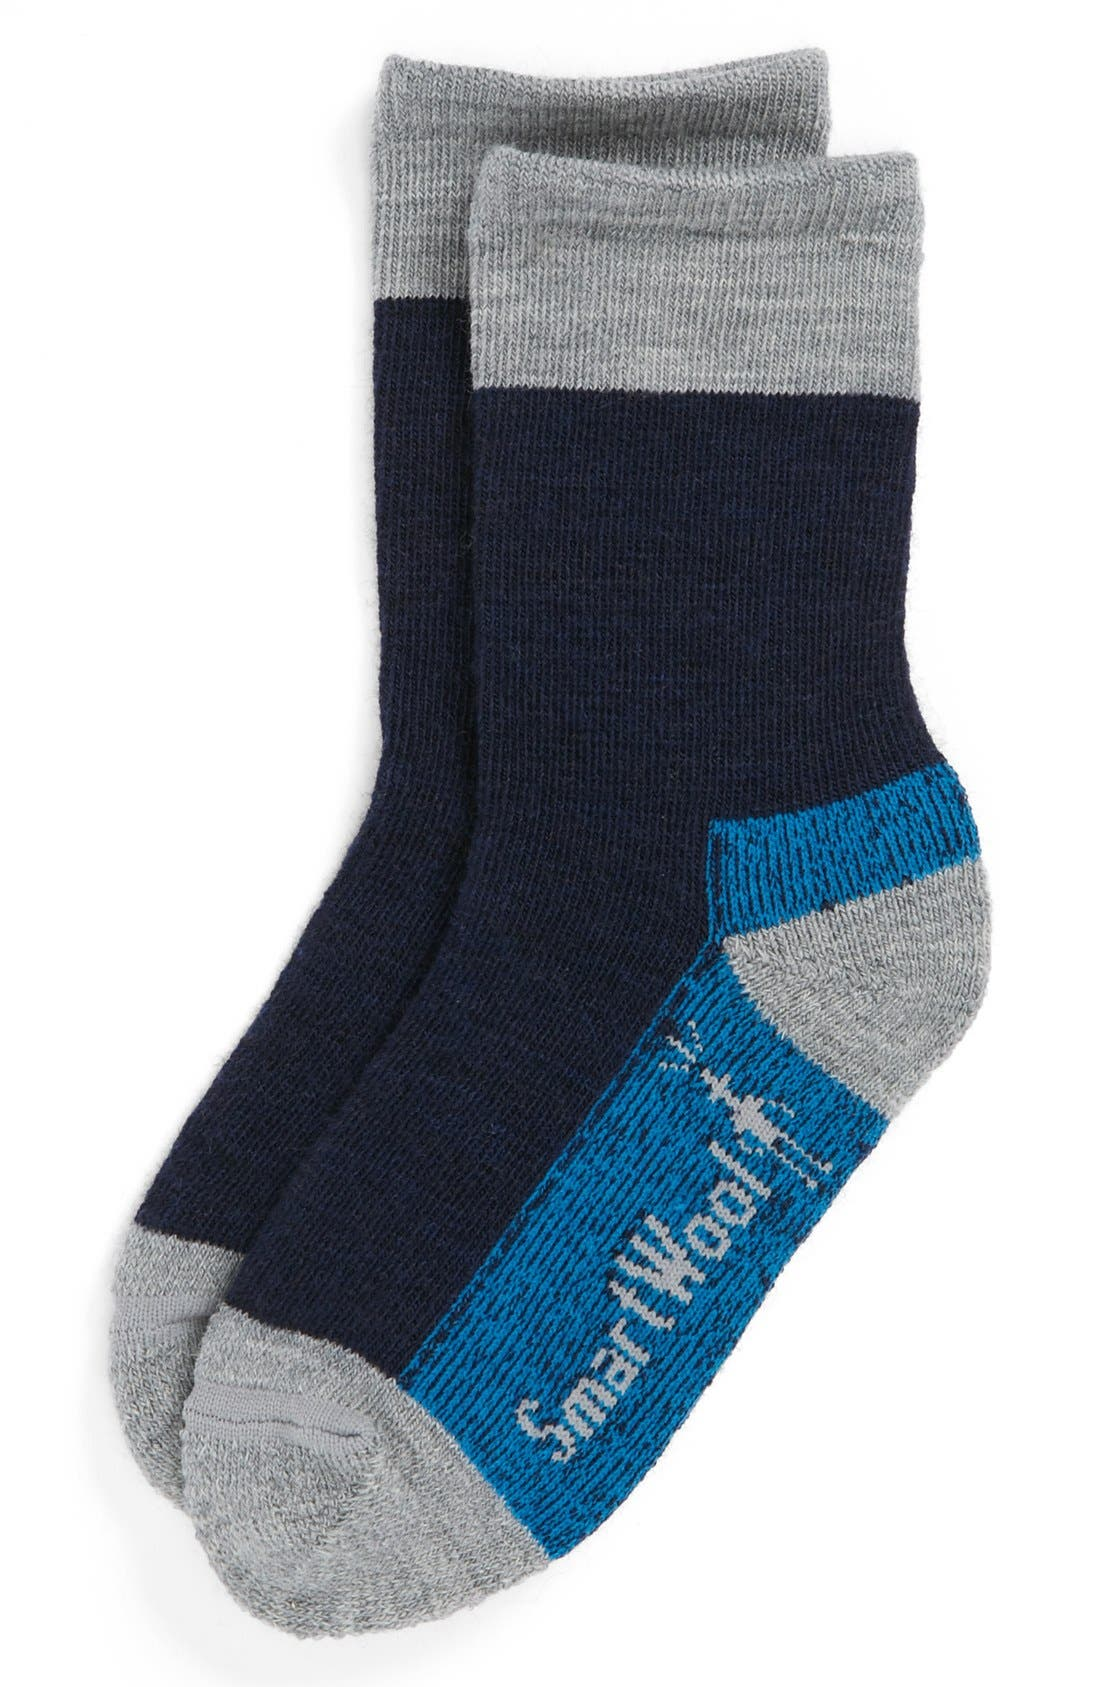 Alternate Image 1 Selected - Smartwool 'Hikerstreet' Socks (Toddler, Little Boys & Big Boys)